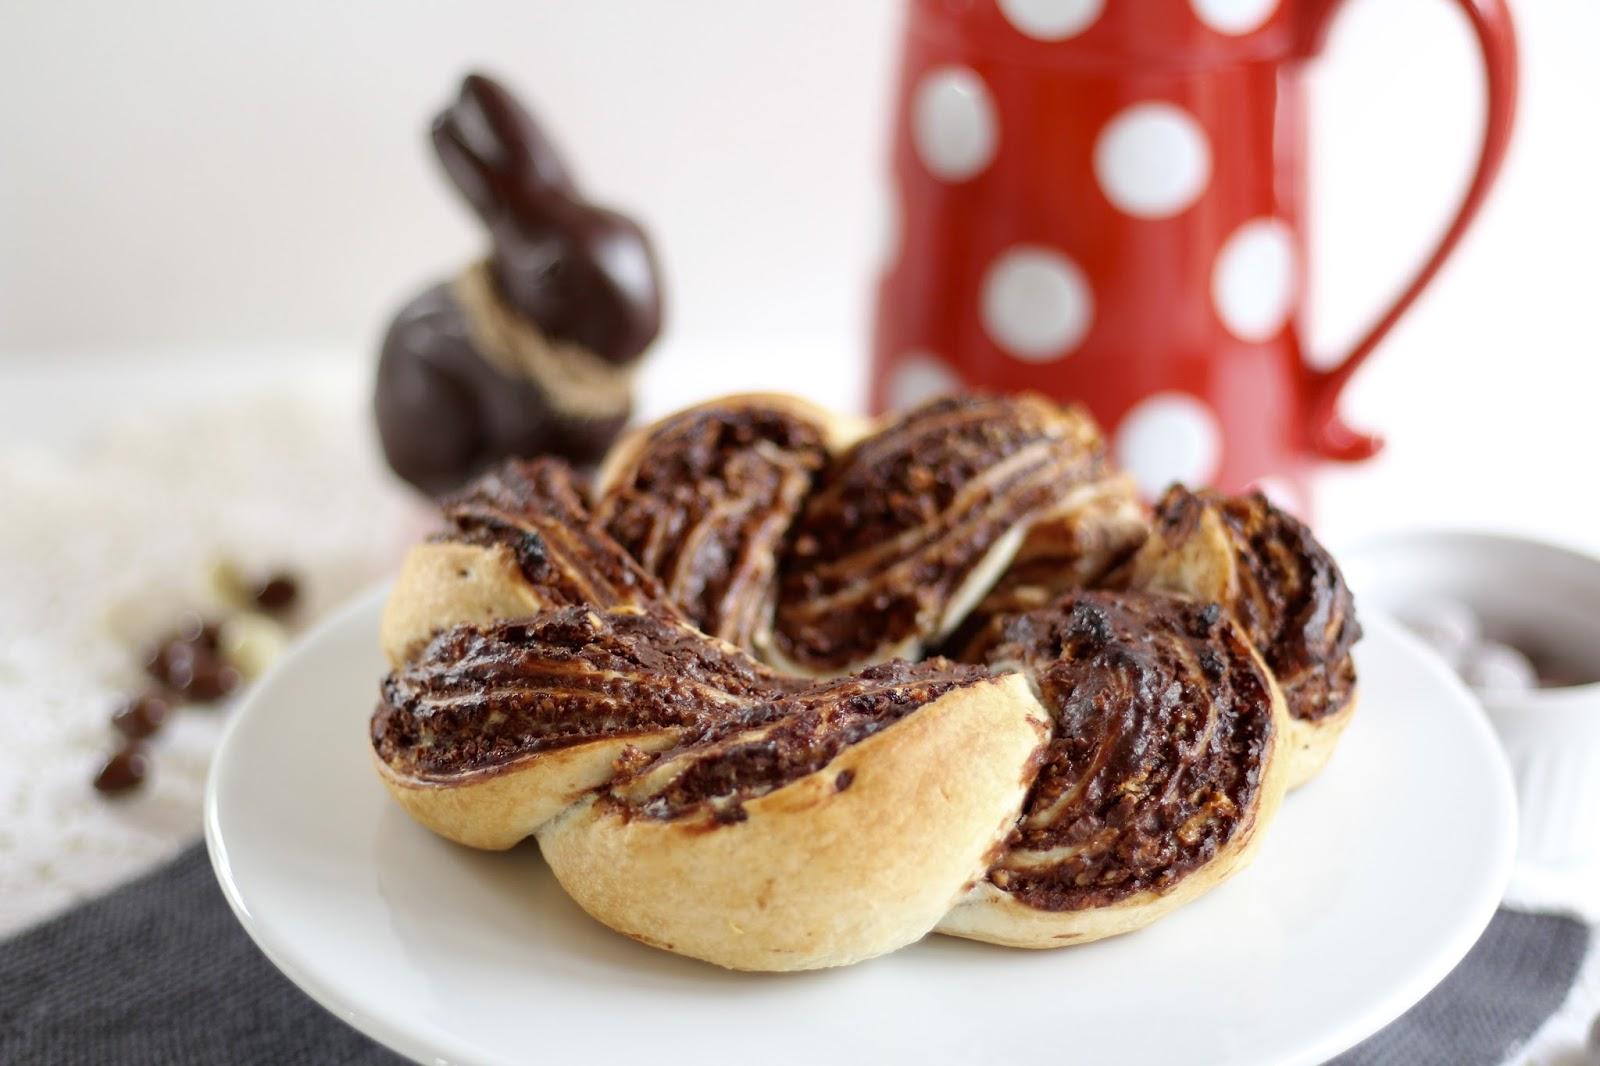 Schokoladen-Osterkranz aus Blätterteig mit Knusper-Krokant - Rezept-Video